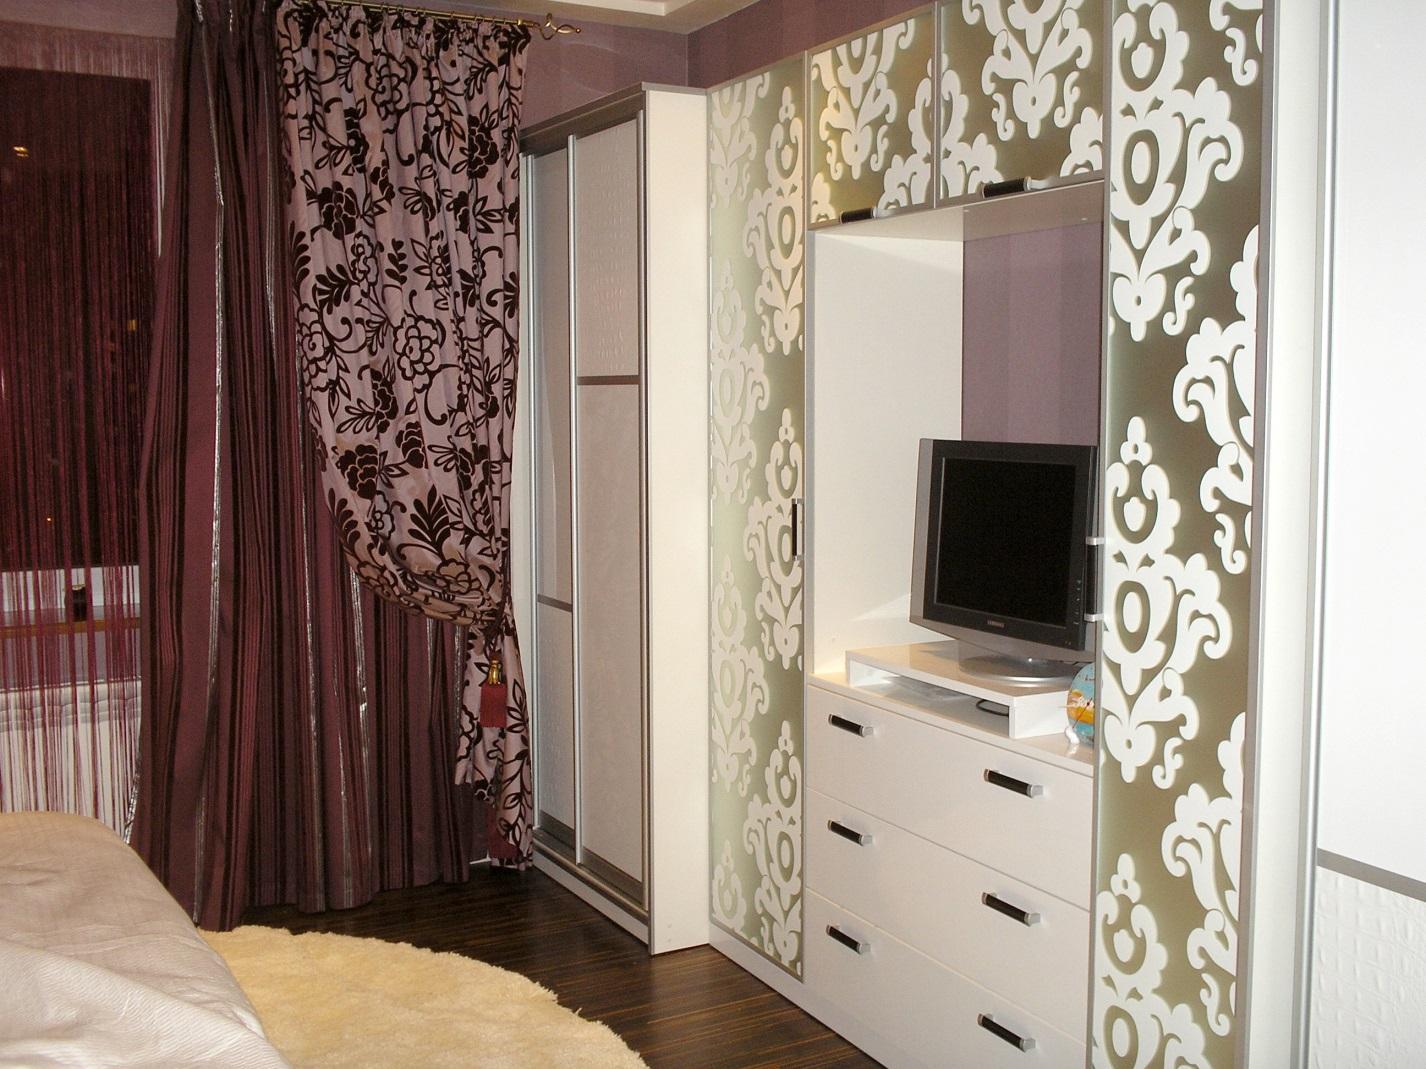 13. Белая гостиная. Шкафы центральной части украшены рисунком (покраска) на зеркале «сатин».